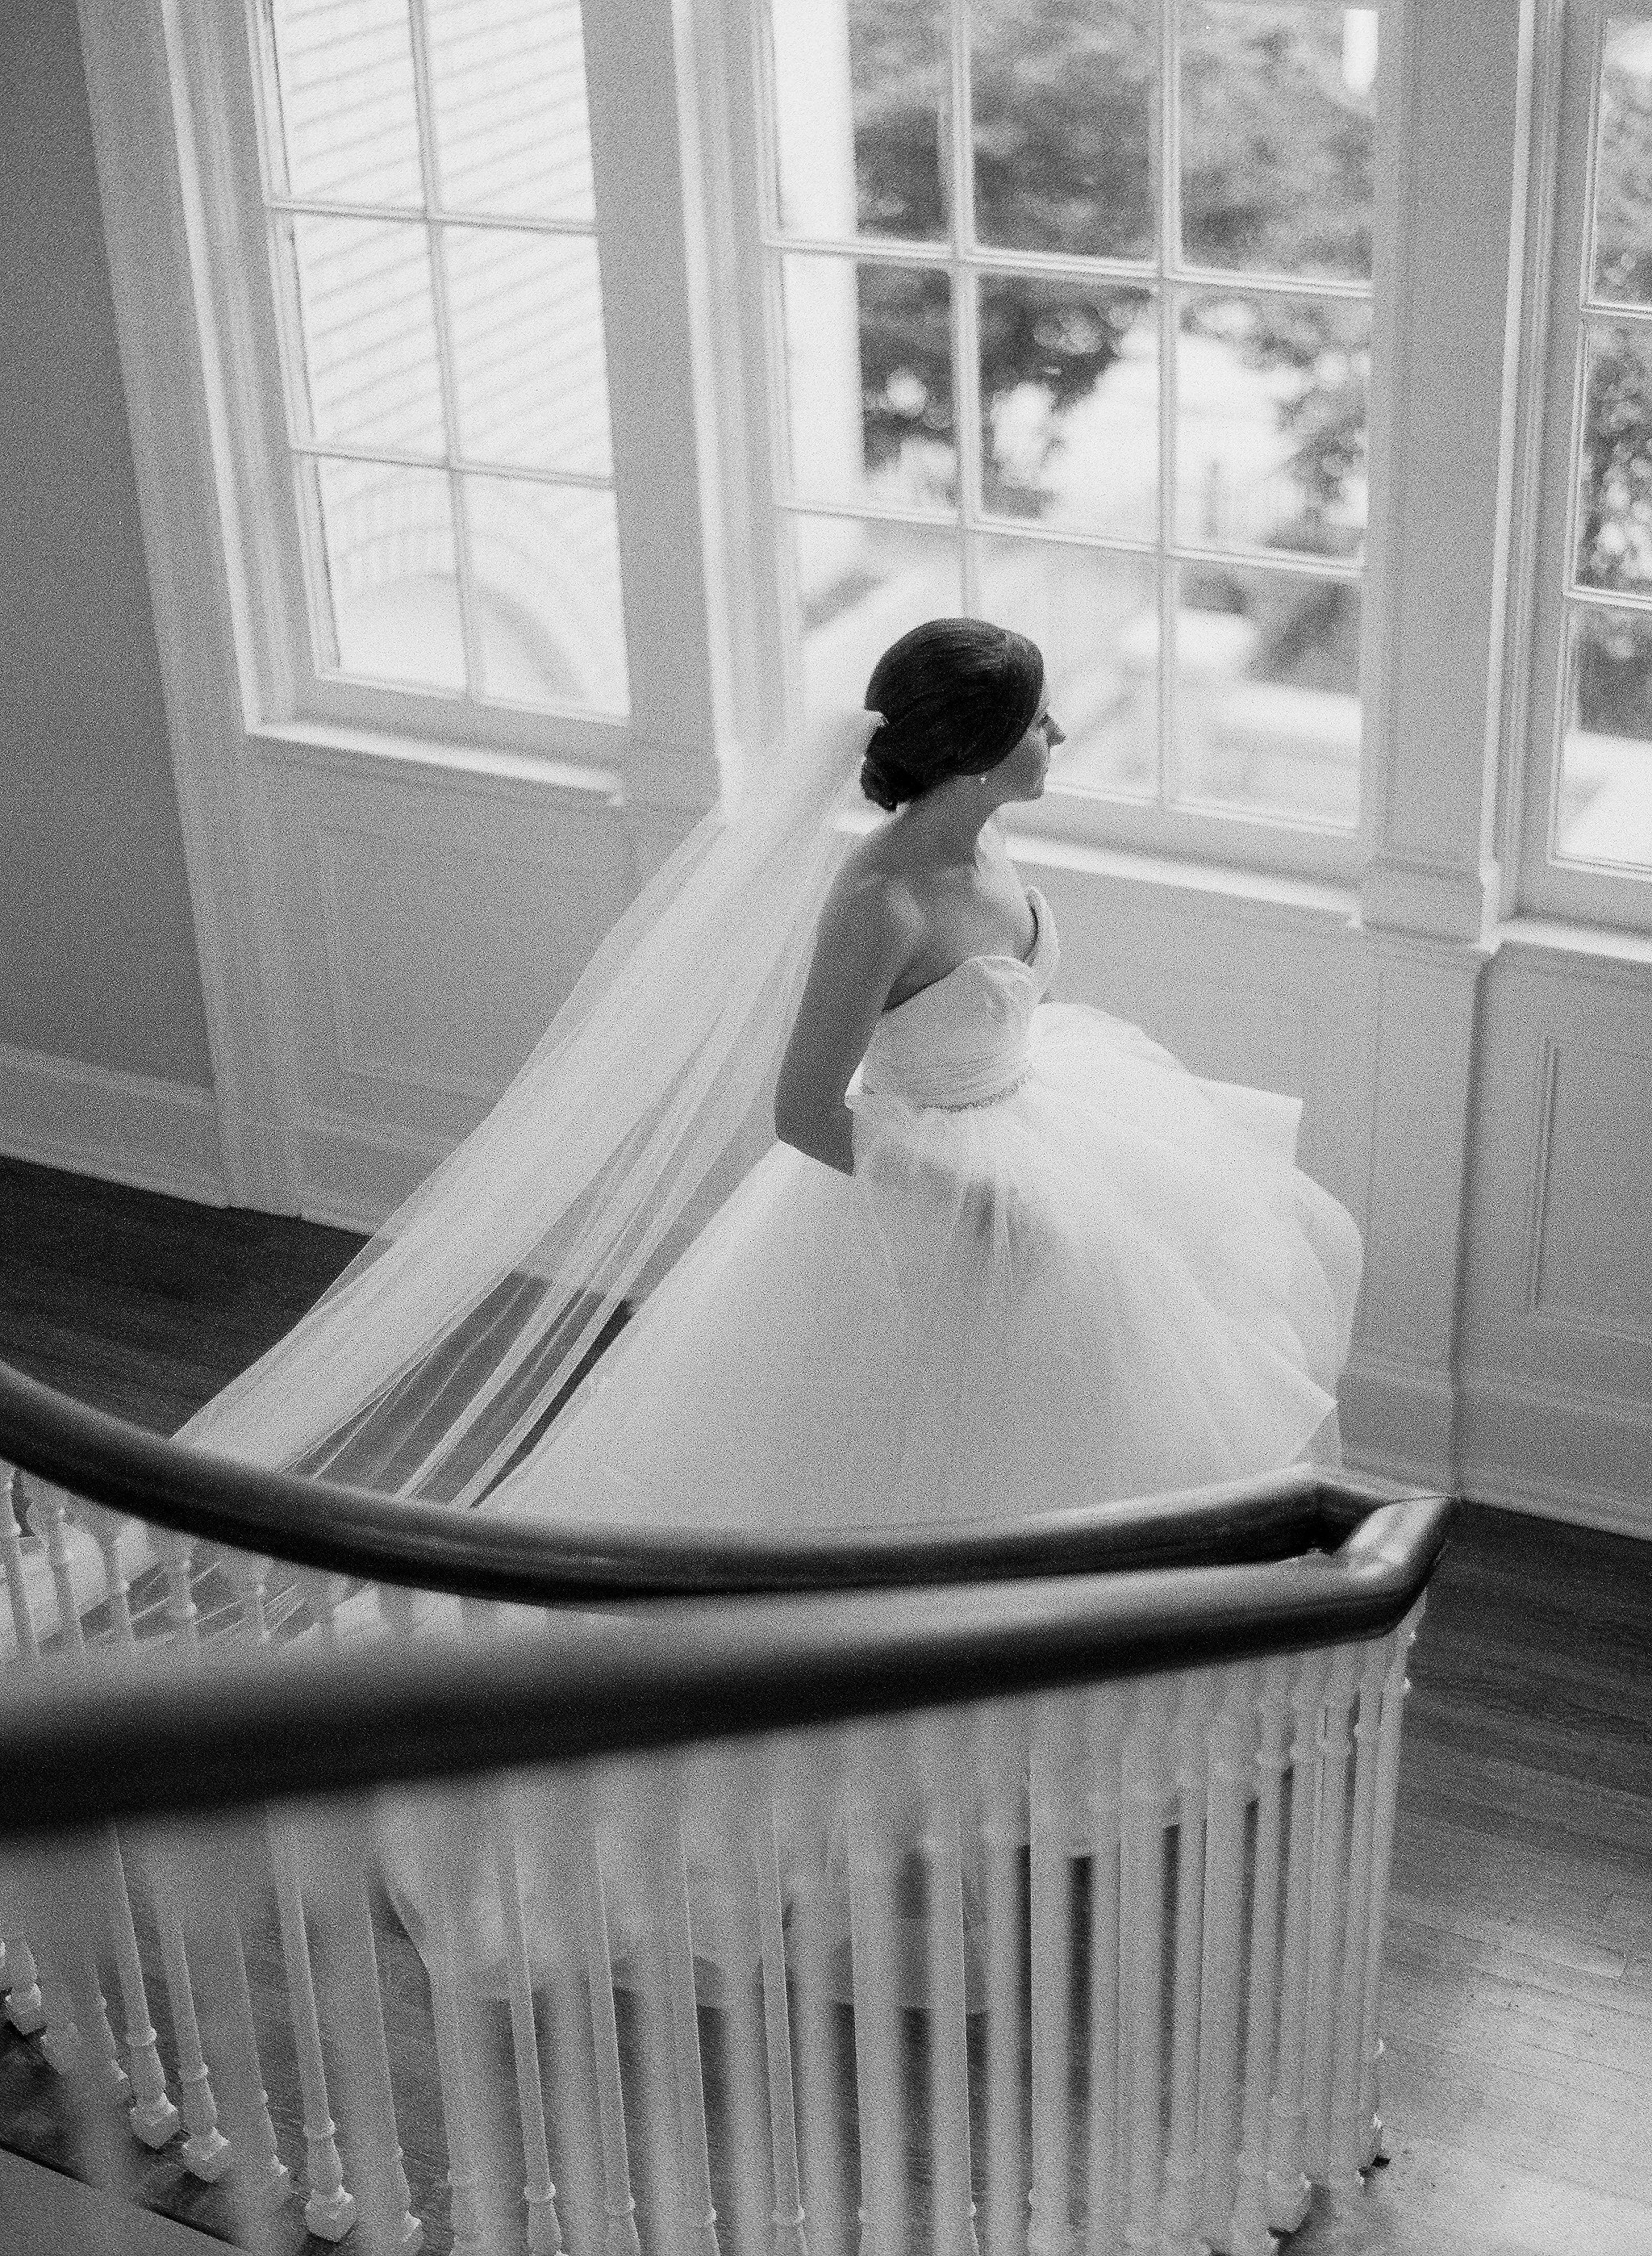 North-Carolina-Bridal-Photographer-Rebecca-12.jpg